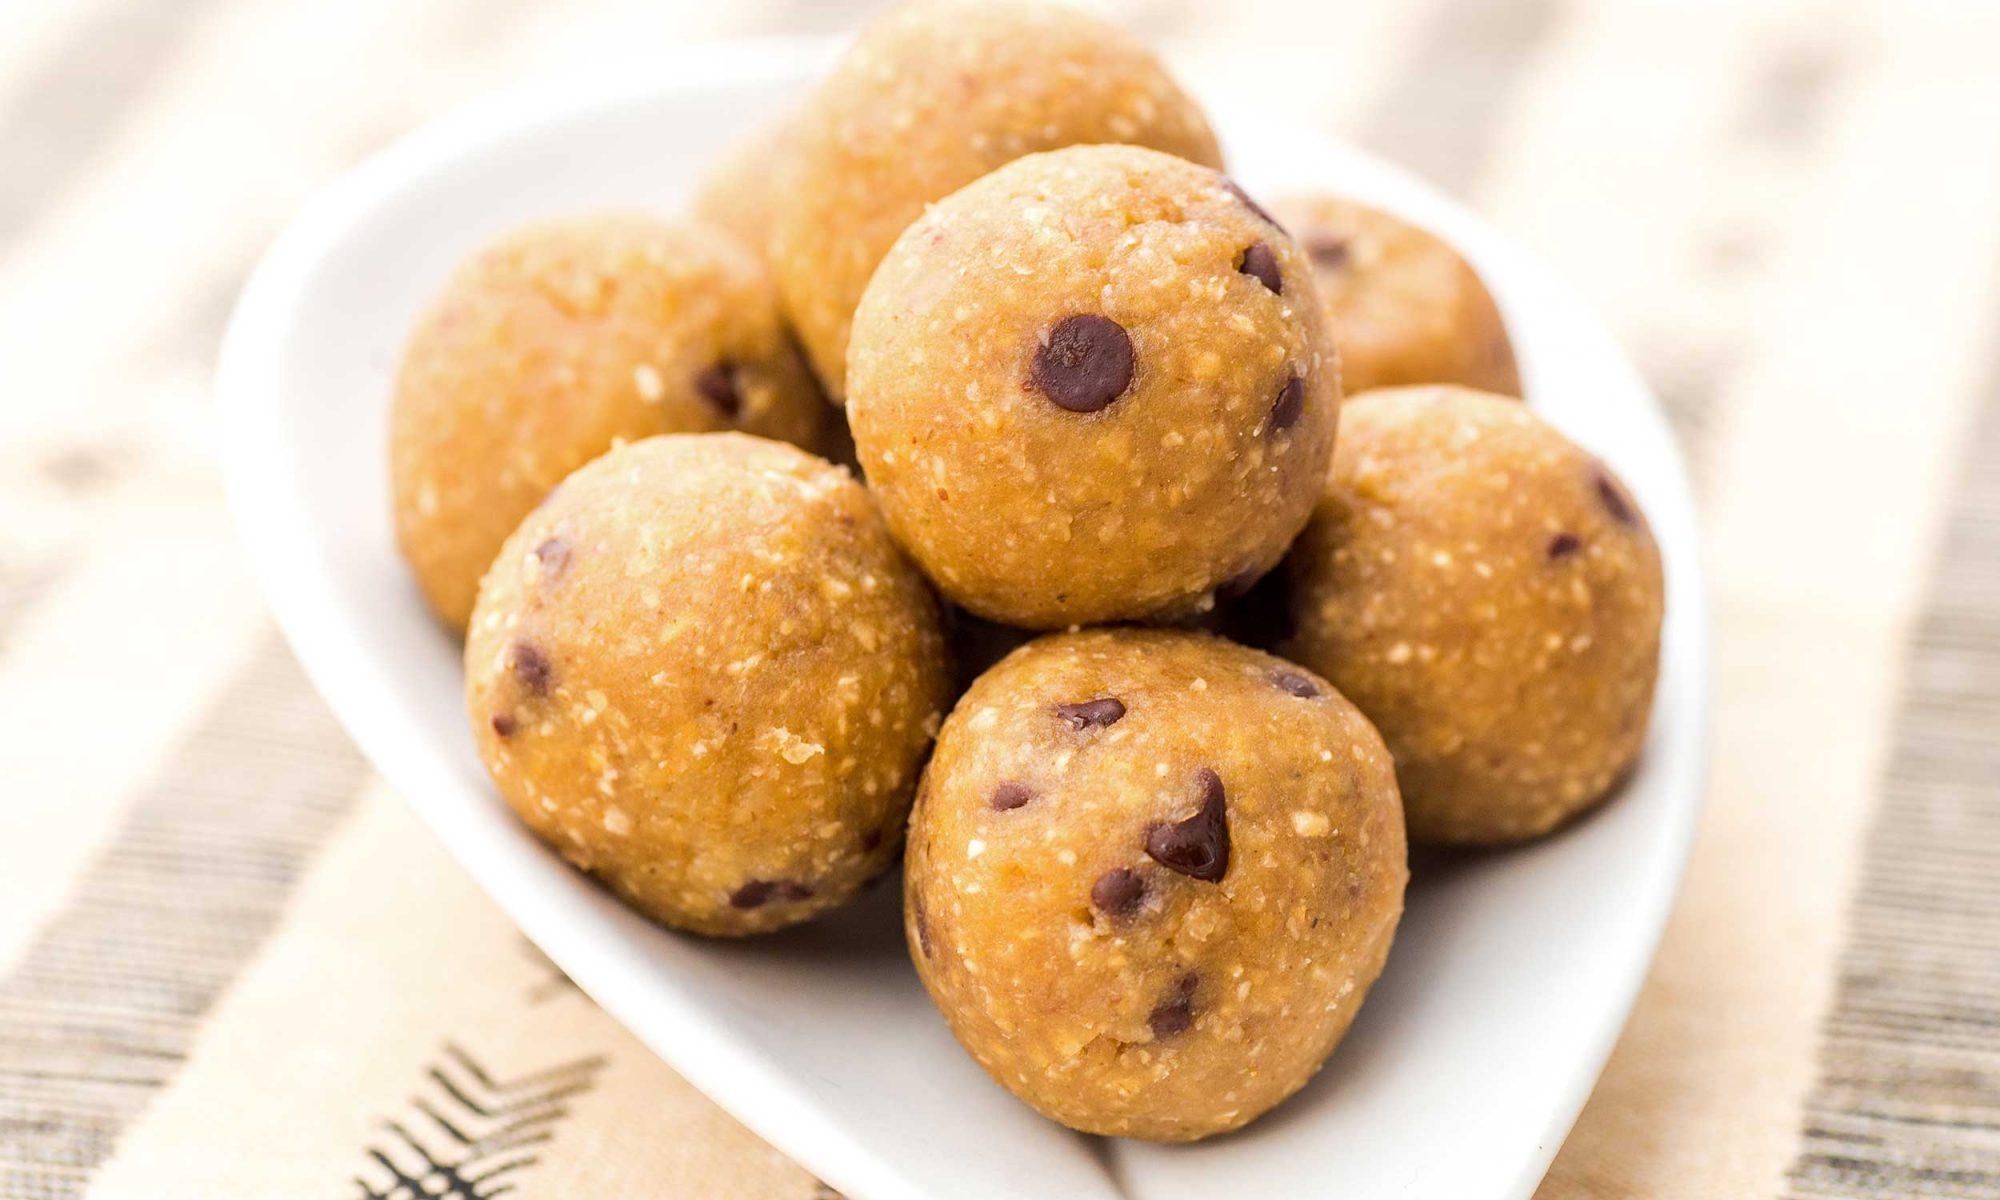 Peanut Butter Chickpea Energy Balls on White Plate